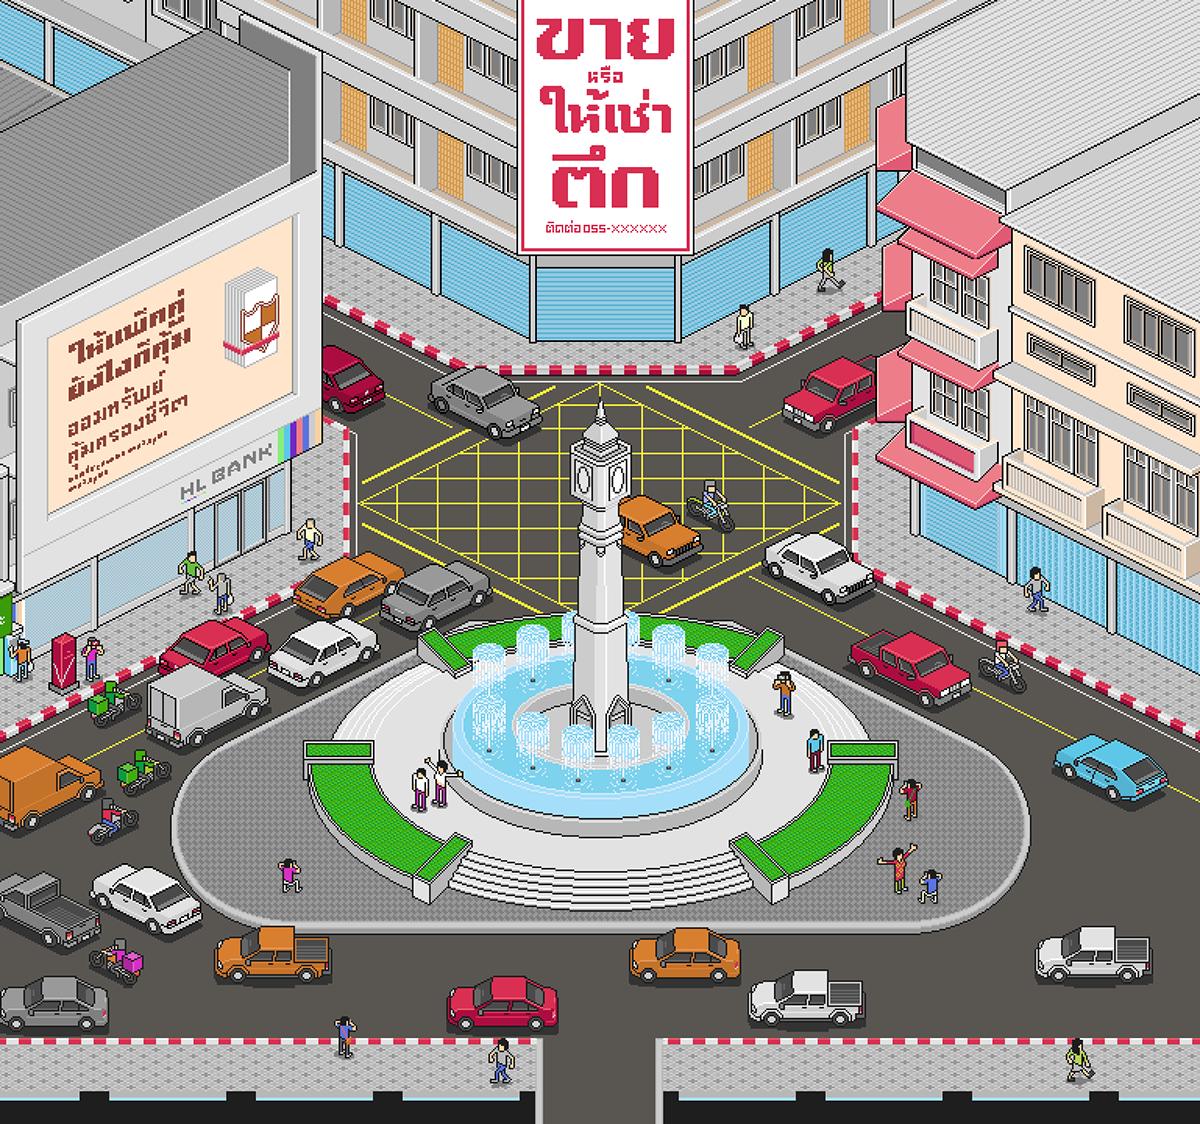 community digital identity Phitsanulok Pixel art Thailand